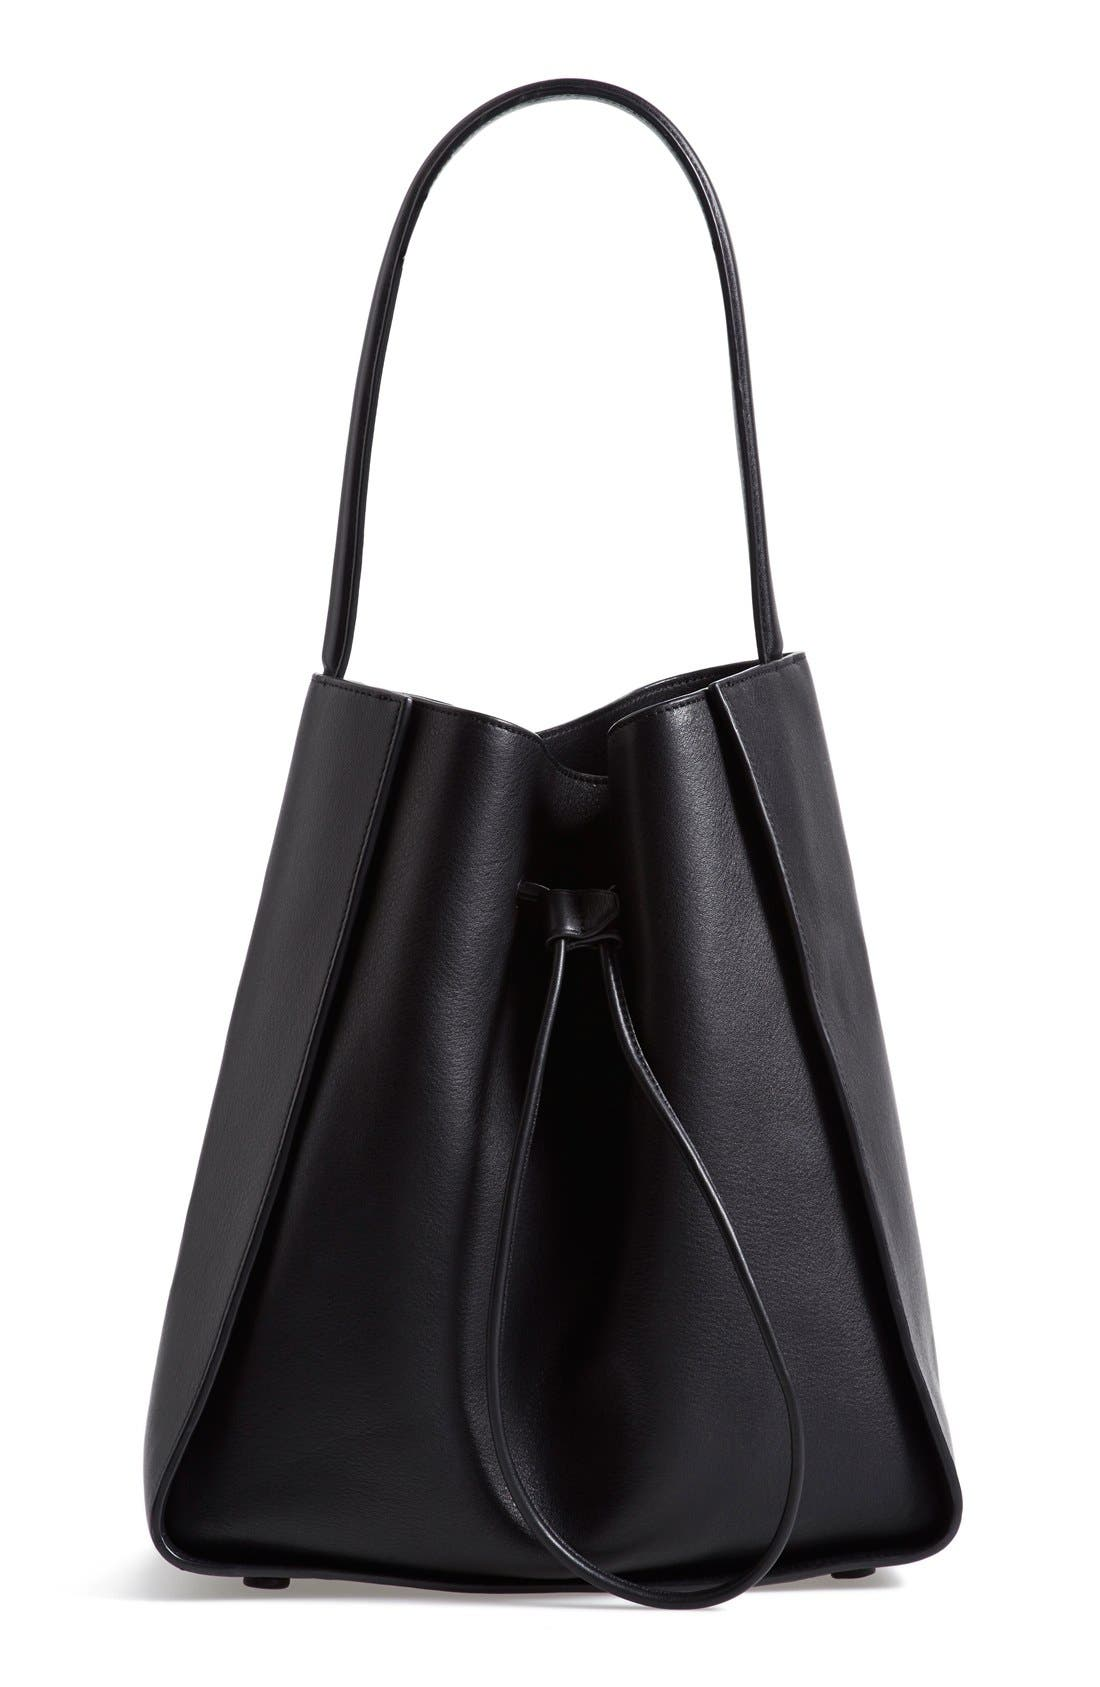 Main Image - 3.1 Phillip Lim 'Large Soleil' Leather Bucket Bag